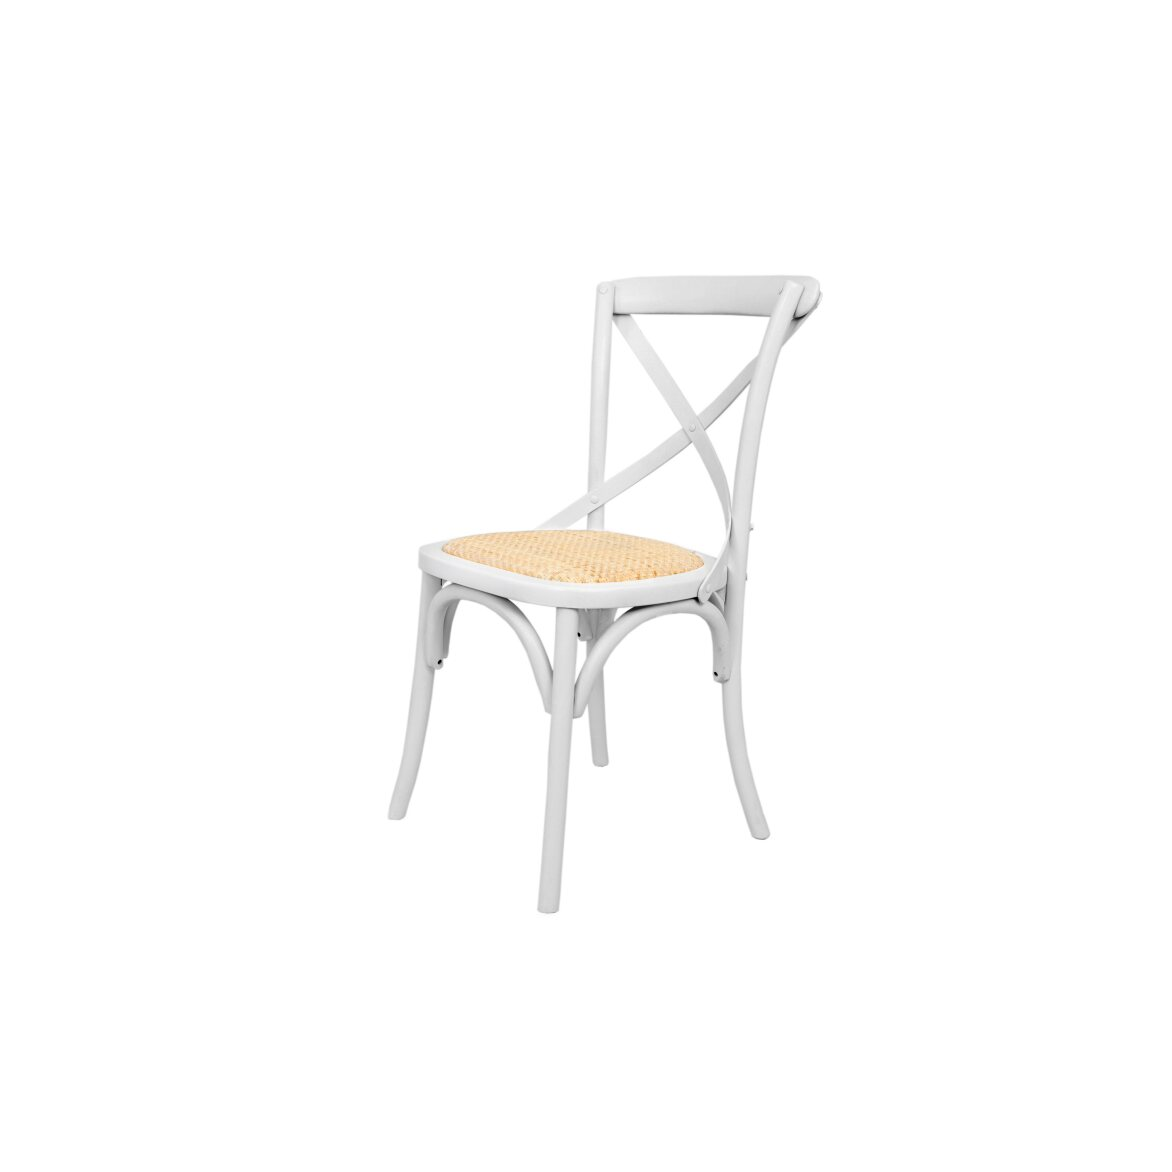 Стул Cross back white 4 | Обеденные стулья Kingsby